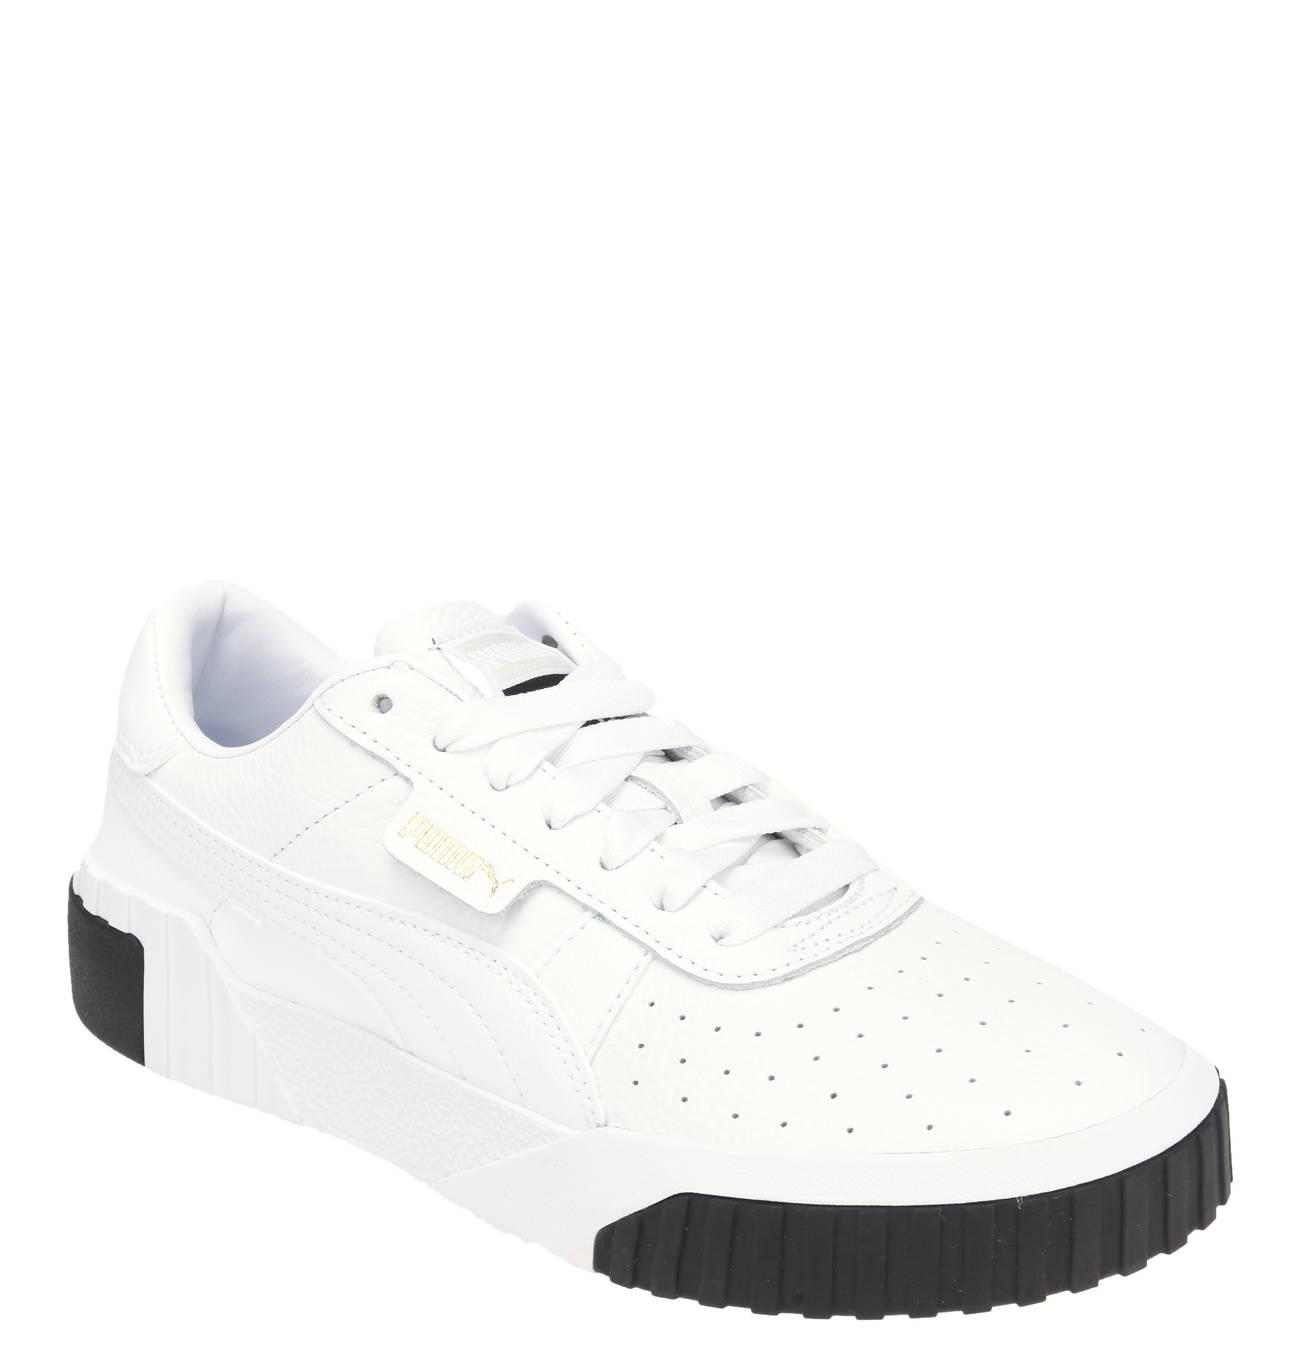 Sneaker Cali Leder Logo Patch Schnurung Turnschuhe Puma Sneaker Und Leder